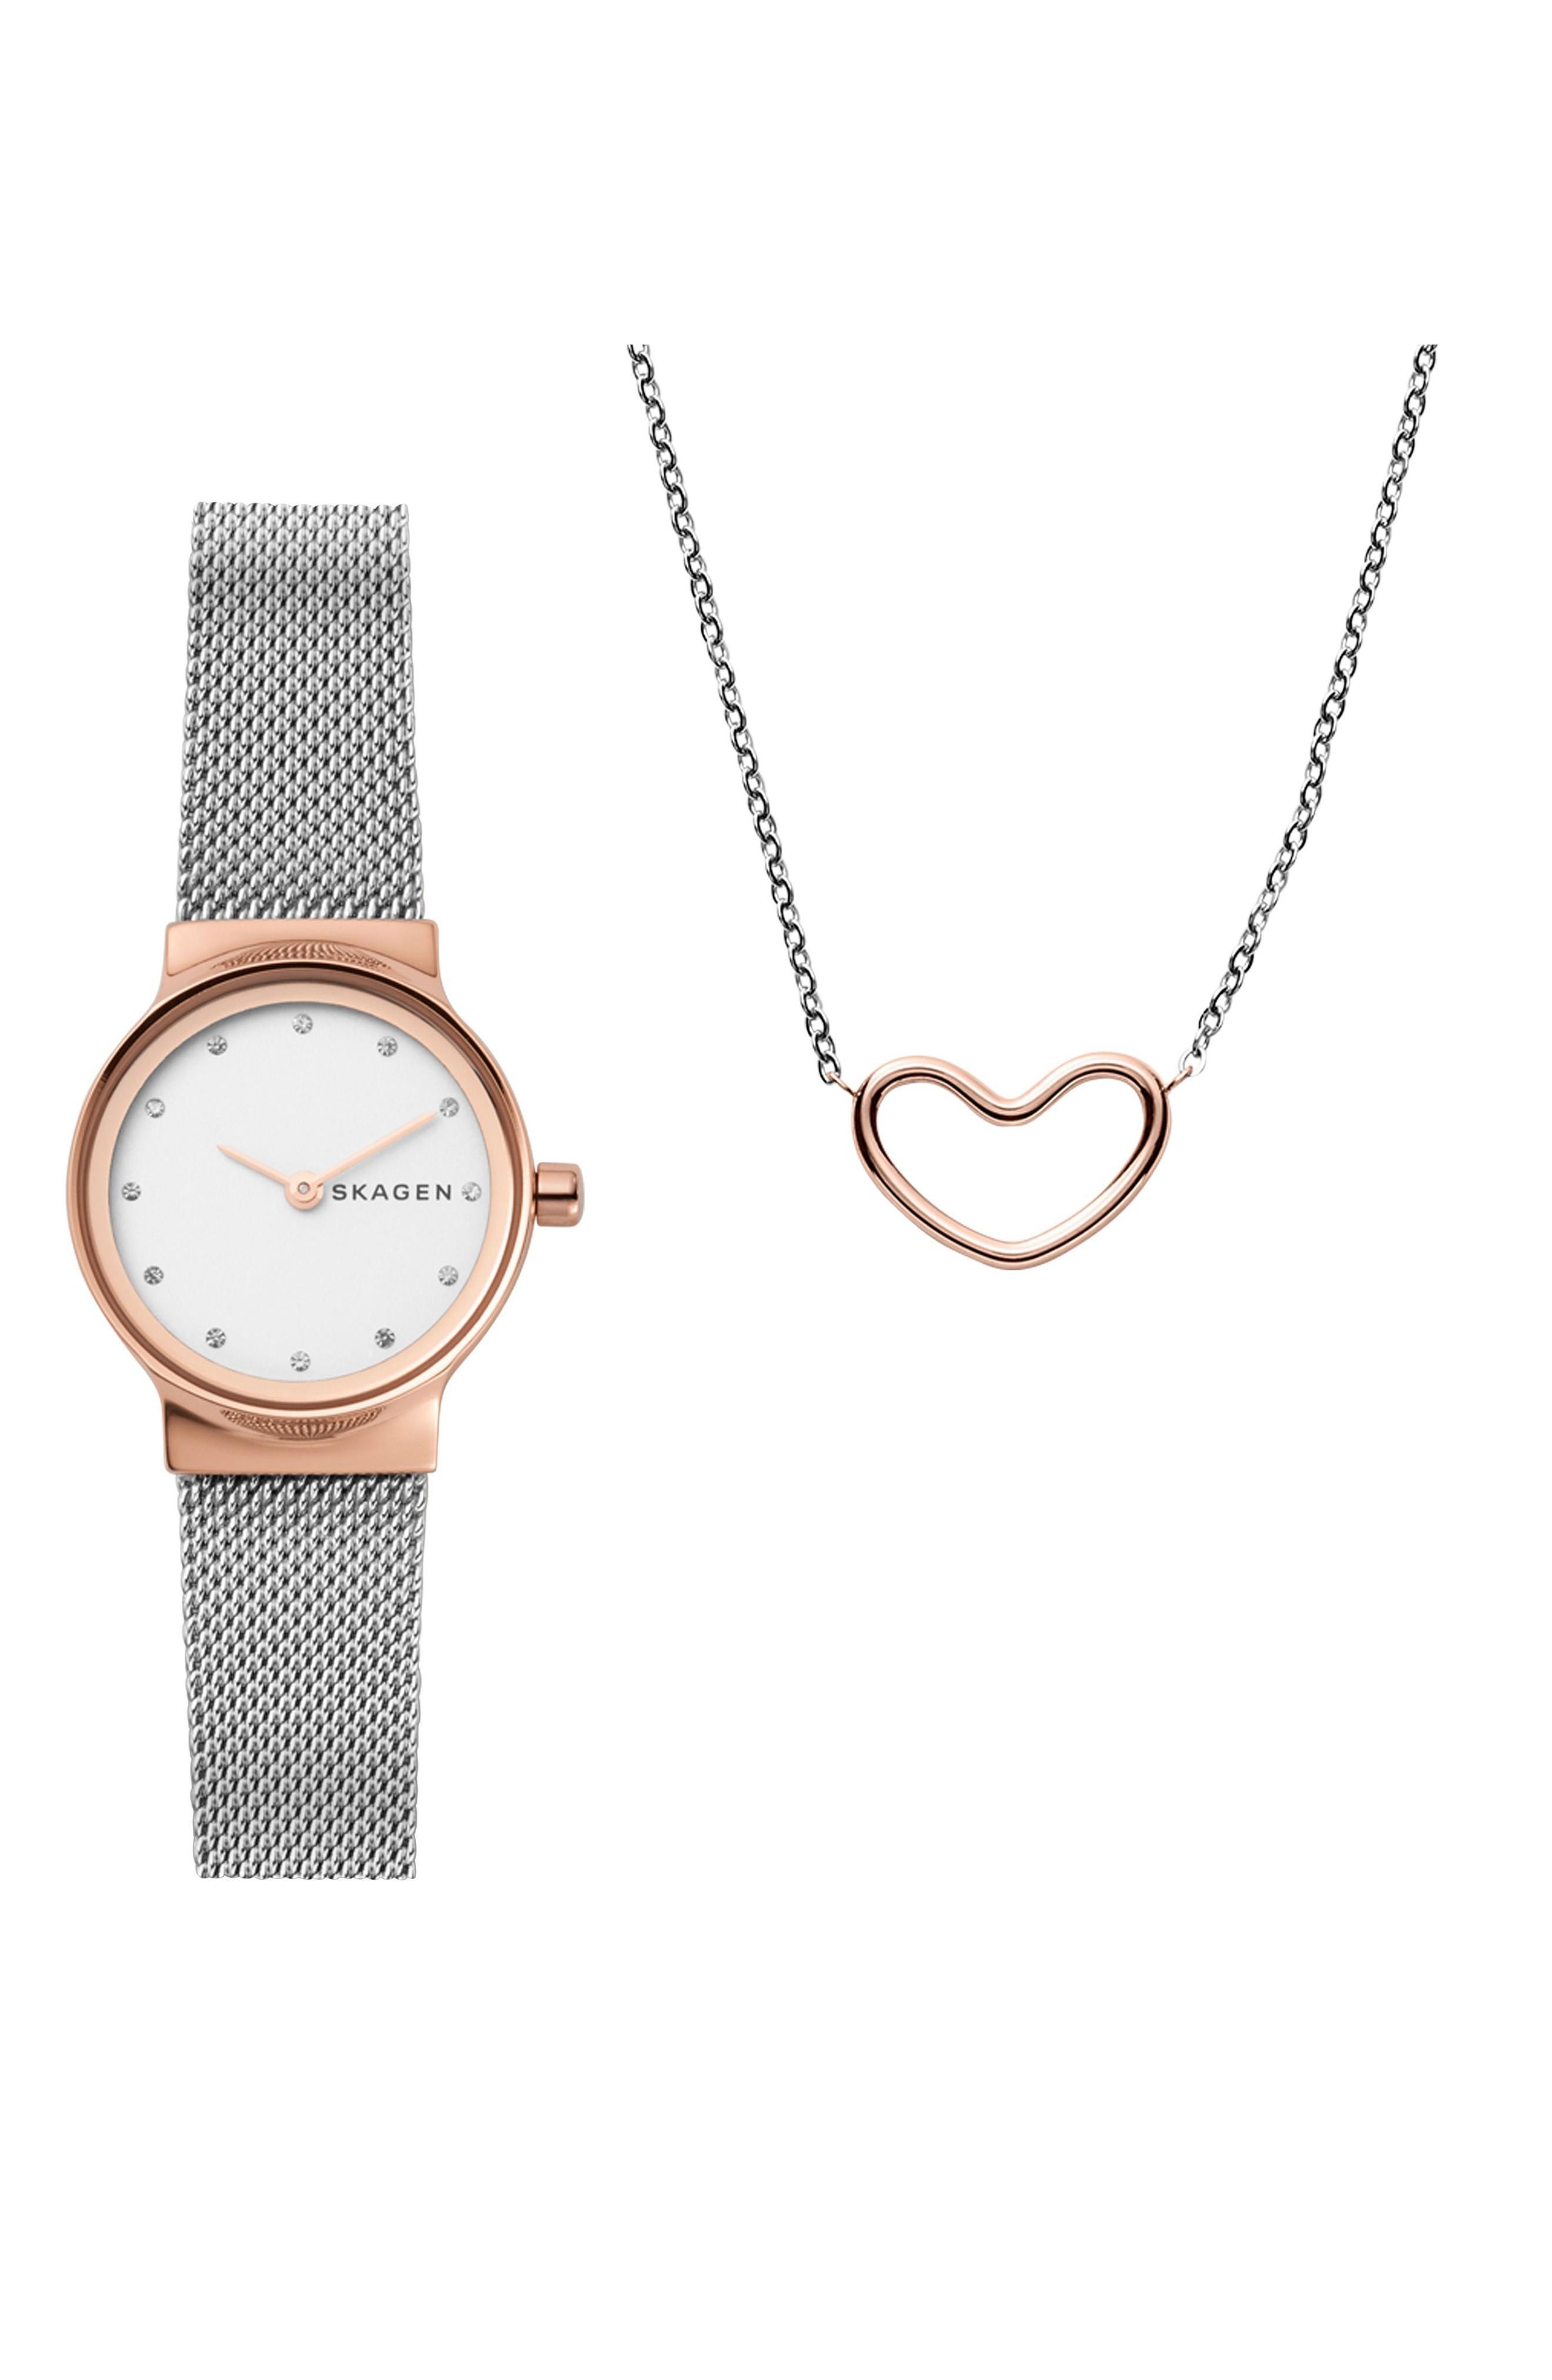 Skagen Freja Crystal Mesh Strap Watch & Necklace Set, 26mm In Silver/ White/ Rose Gold